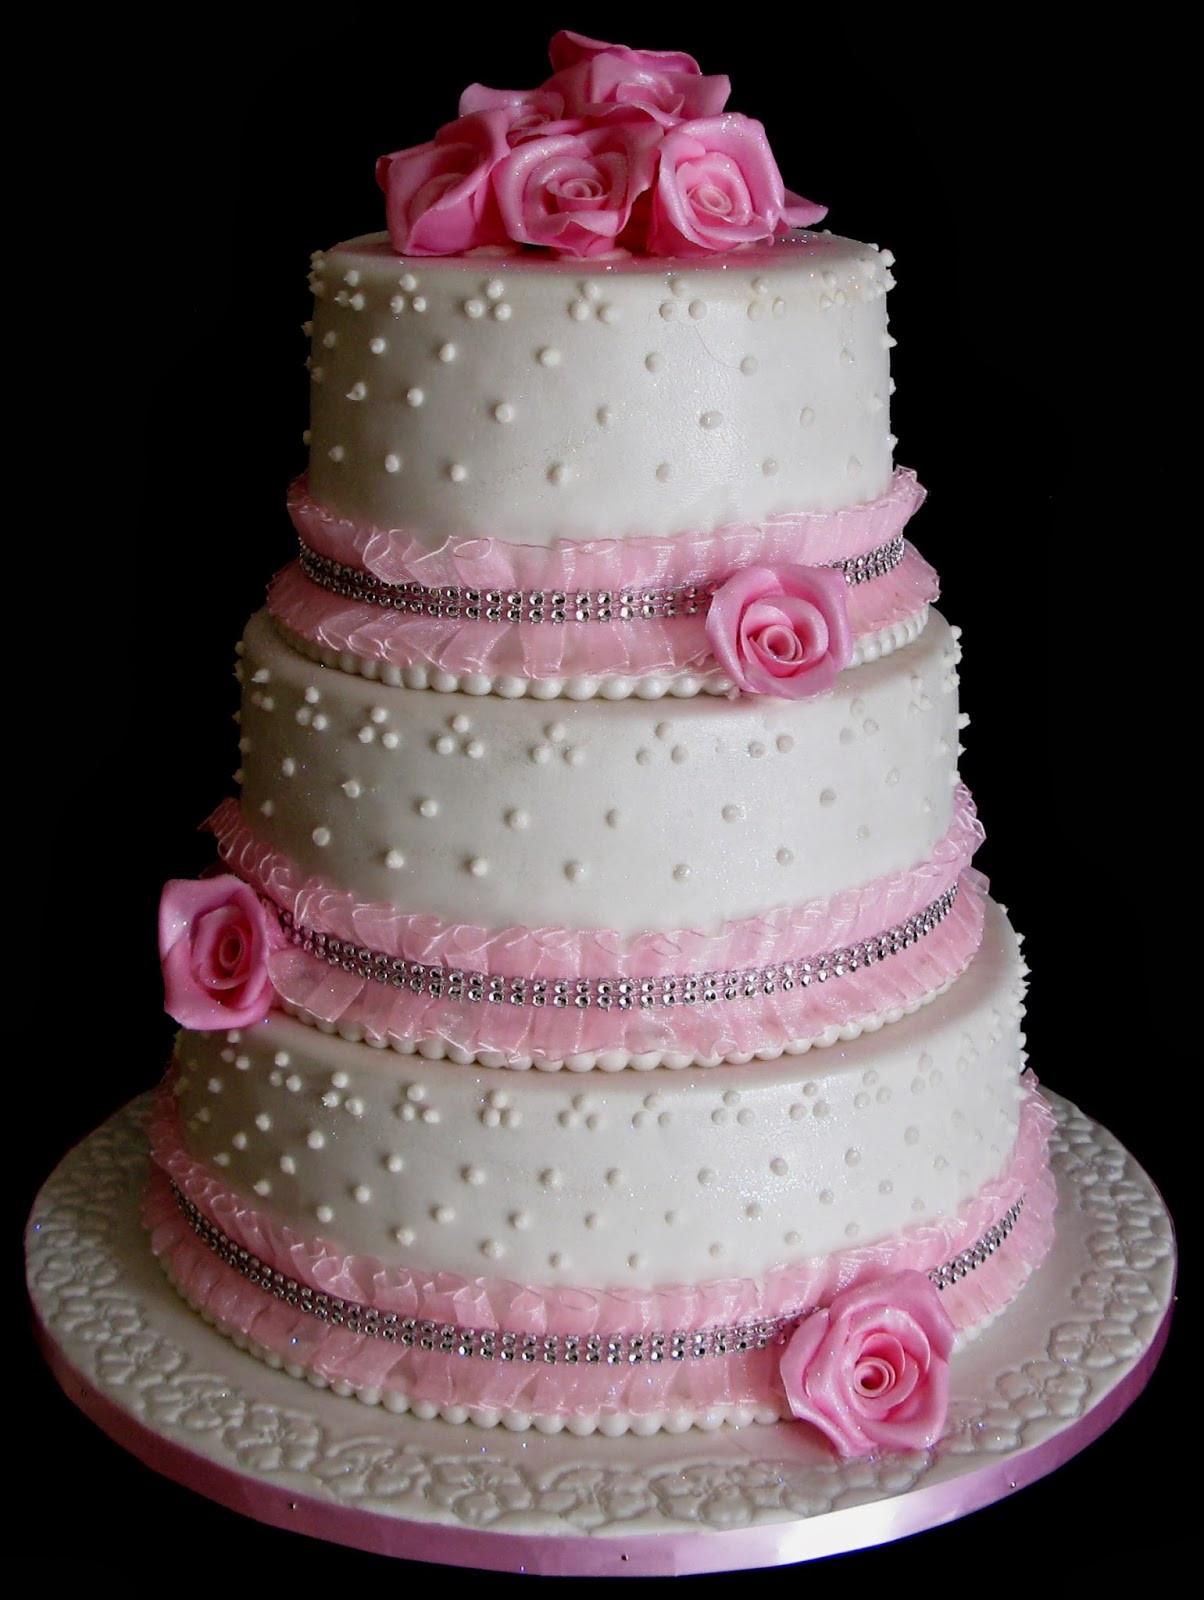 3 Layer Wedding Cakes  Sugarcraft by Soni Three Layer Wedding Cake Pink Roses